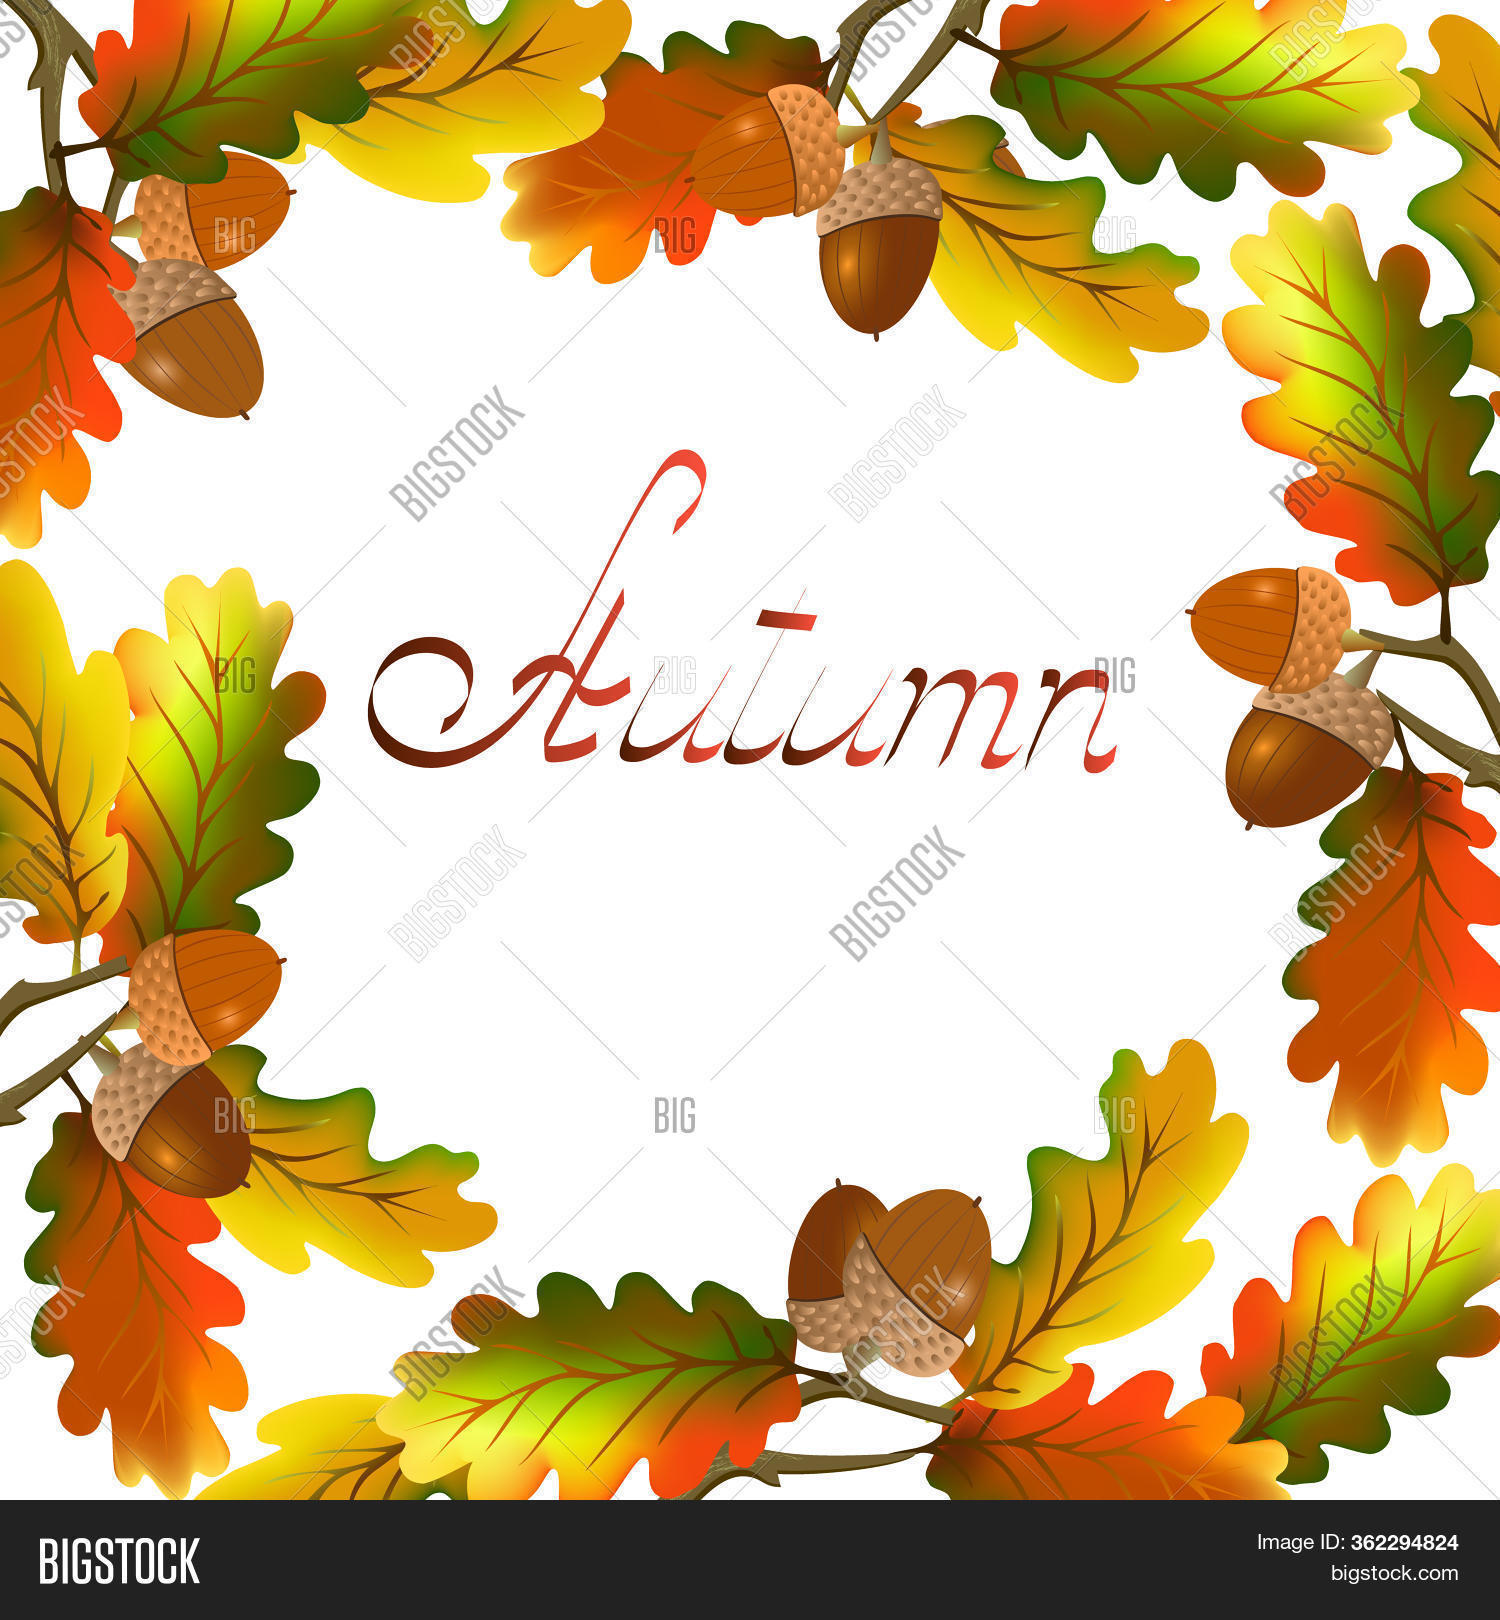 Acorn clipart color, Acorn color Transparent FREE for download on  WebStockReview 2020